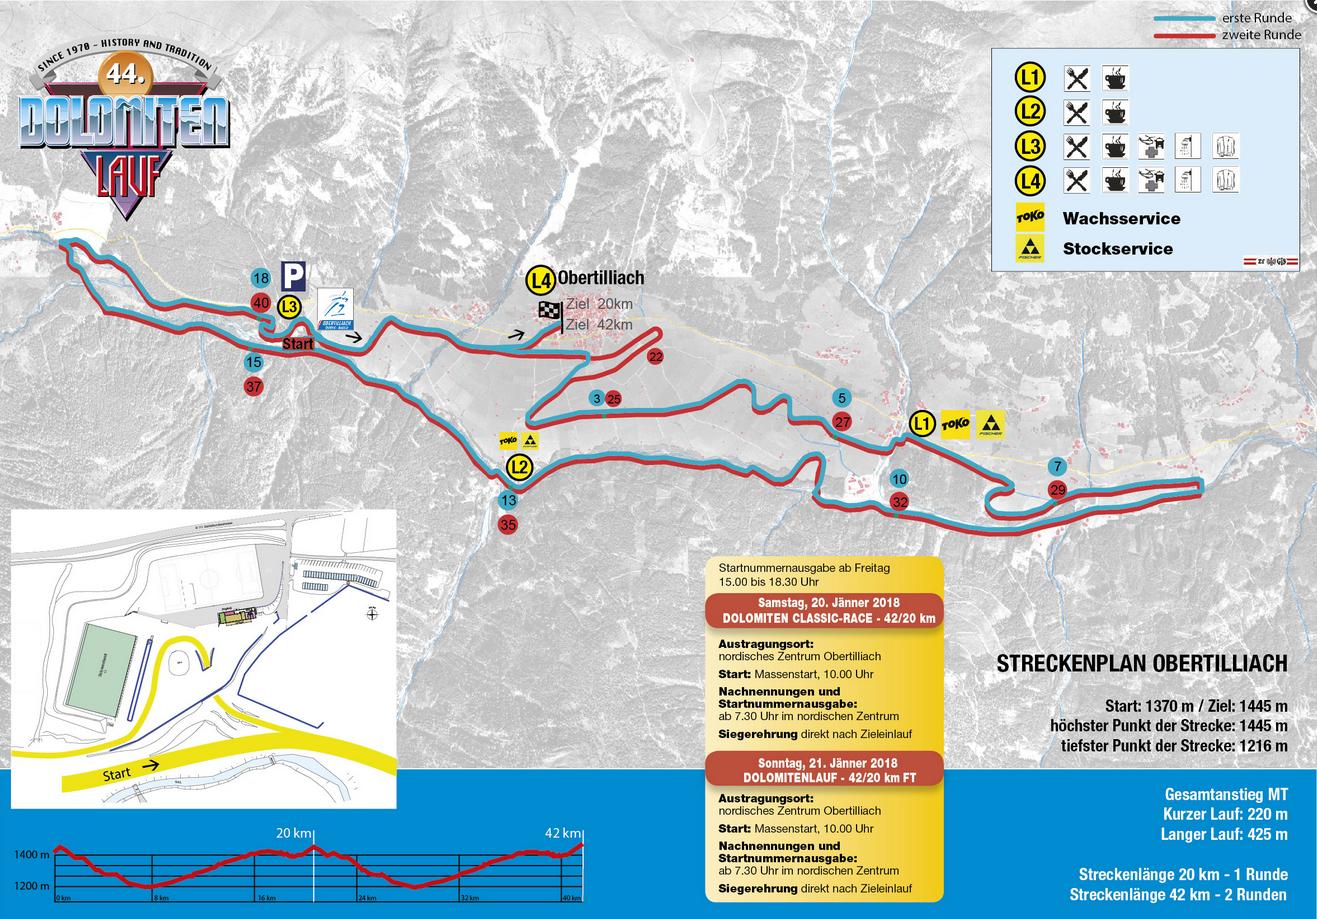 Dolomitenlauf Race Course.png